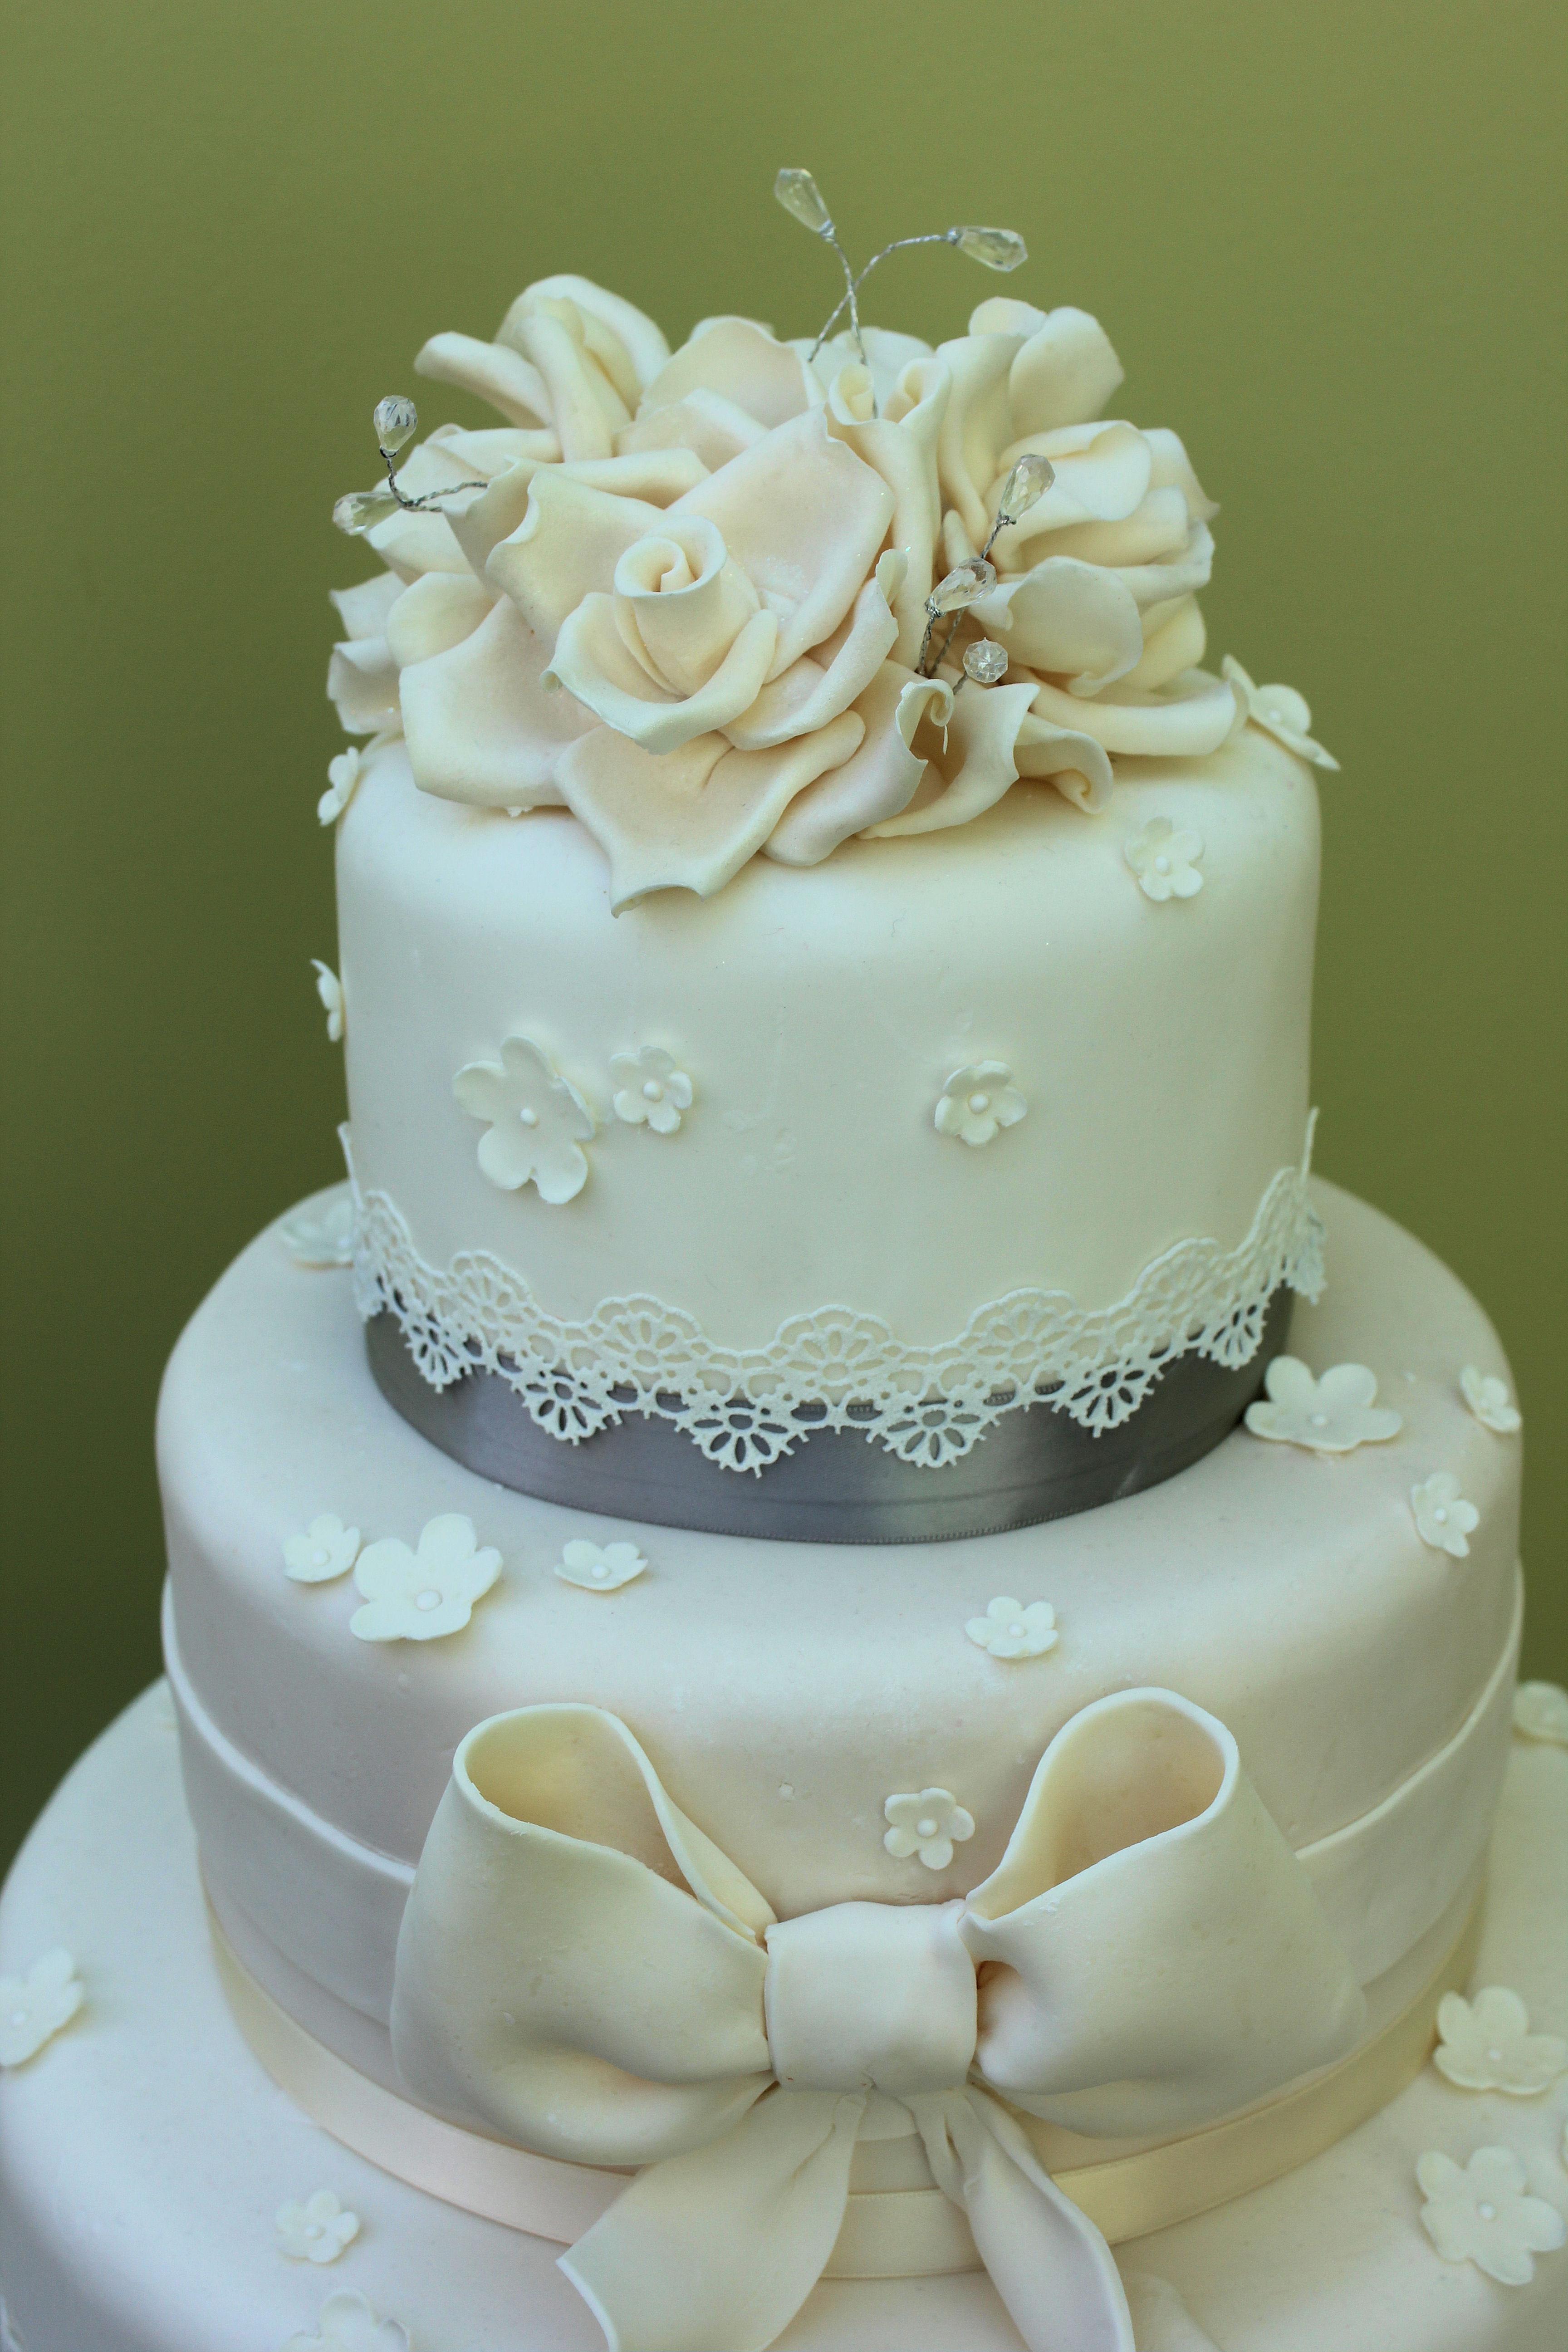 Wedding Cakes Lace  Modern Cake Trends Lace Wedding Cakes Baytree Wedding